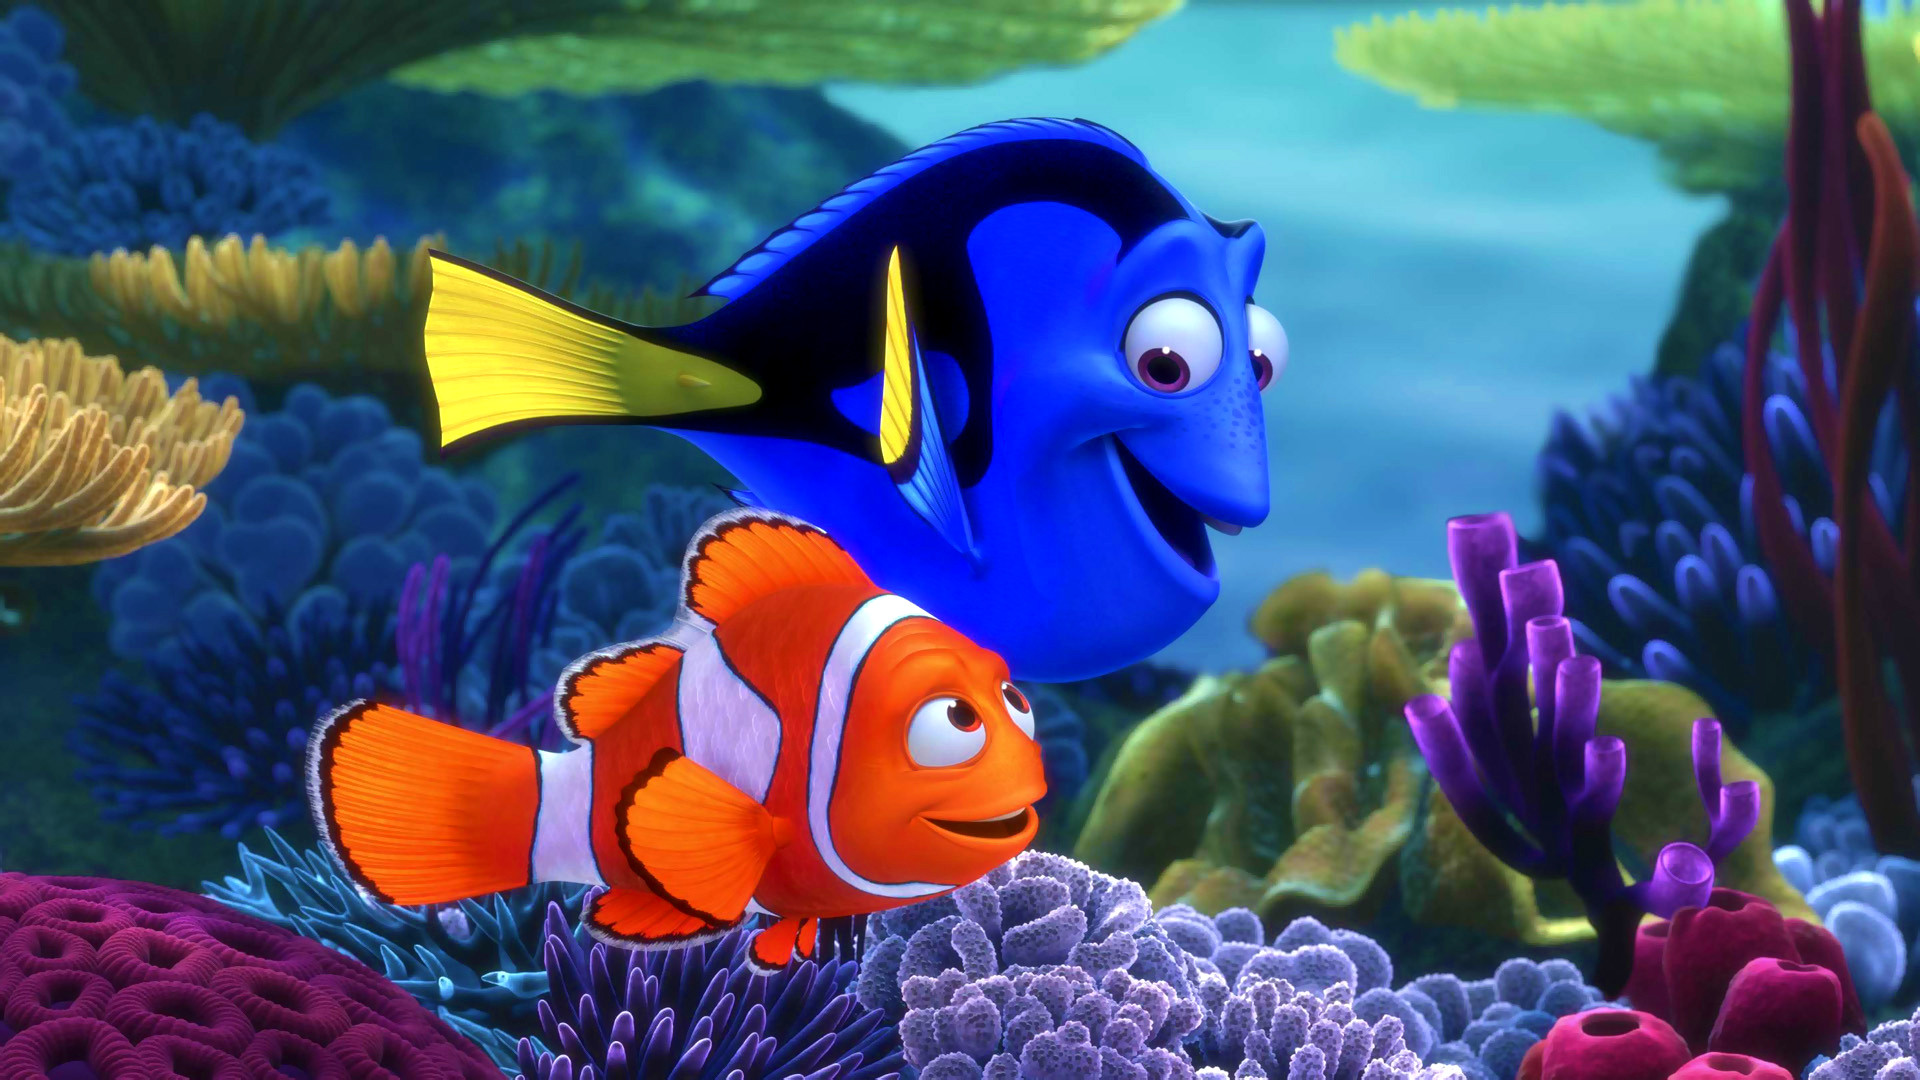 Finding Nemo: Secret Subliminal Messages Hidden in Disney Pixar Movies - M Magazine